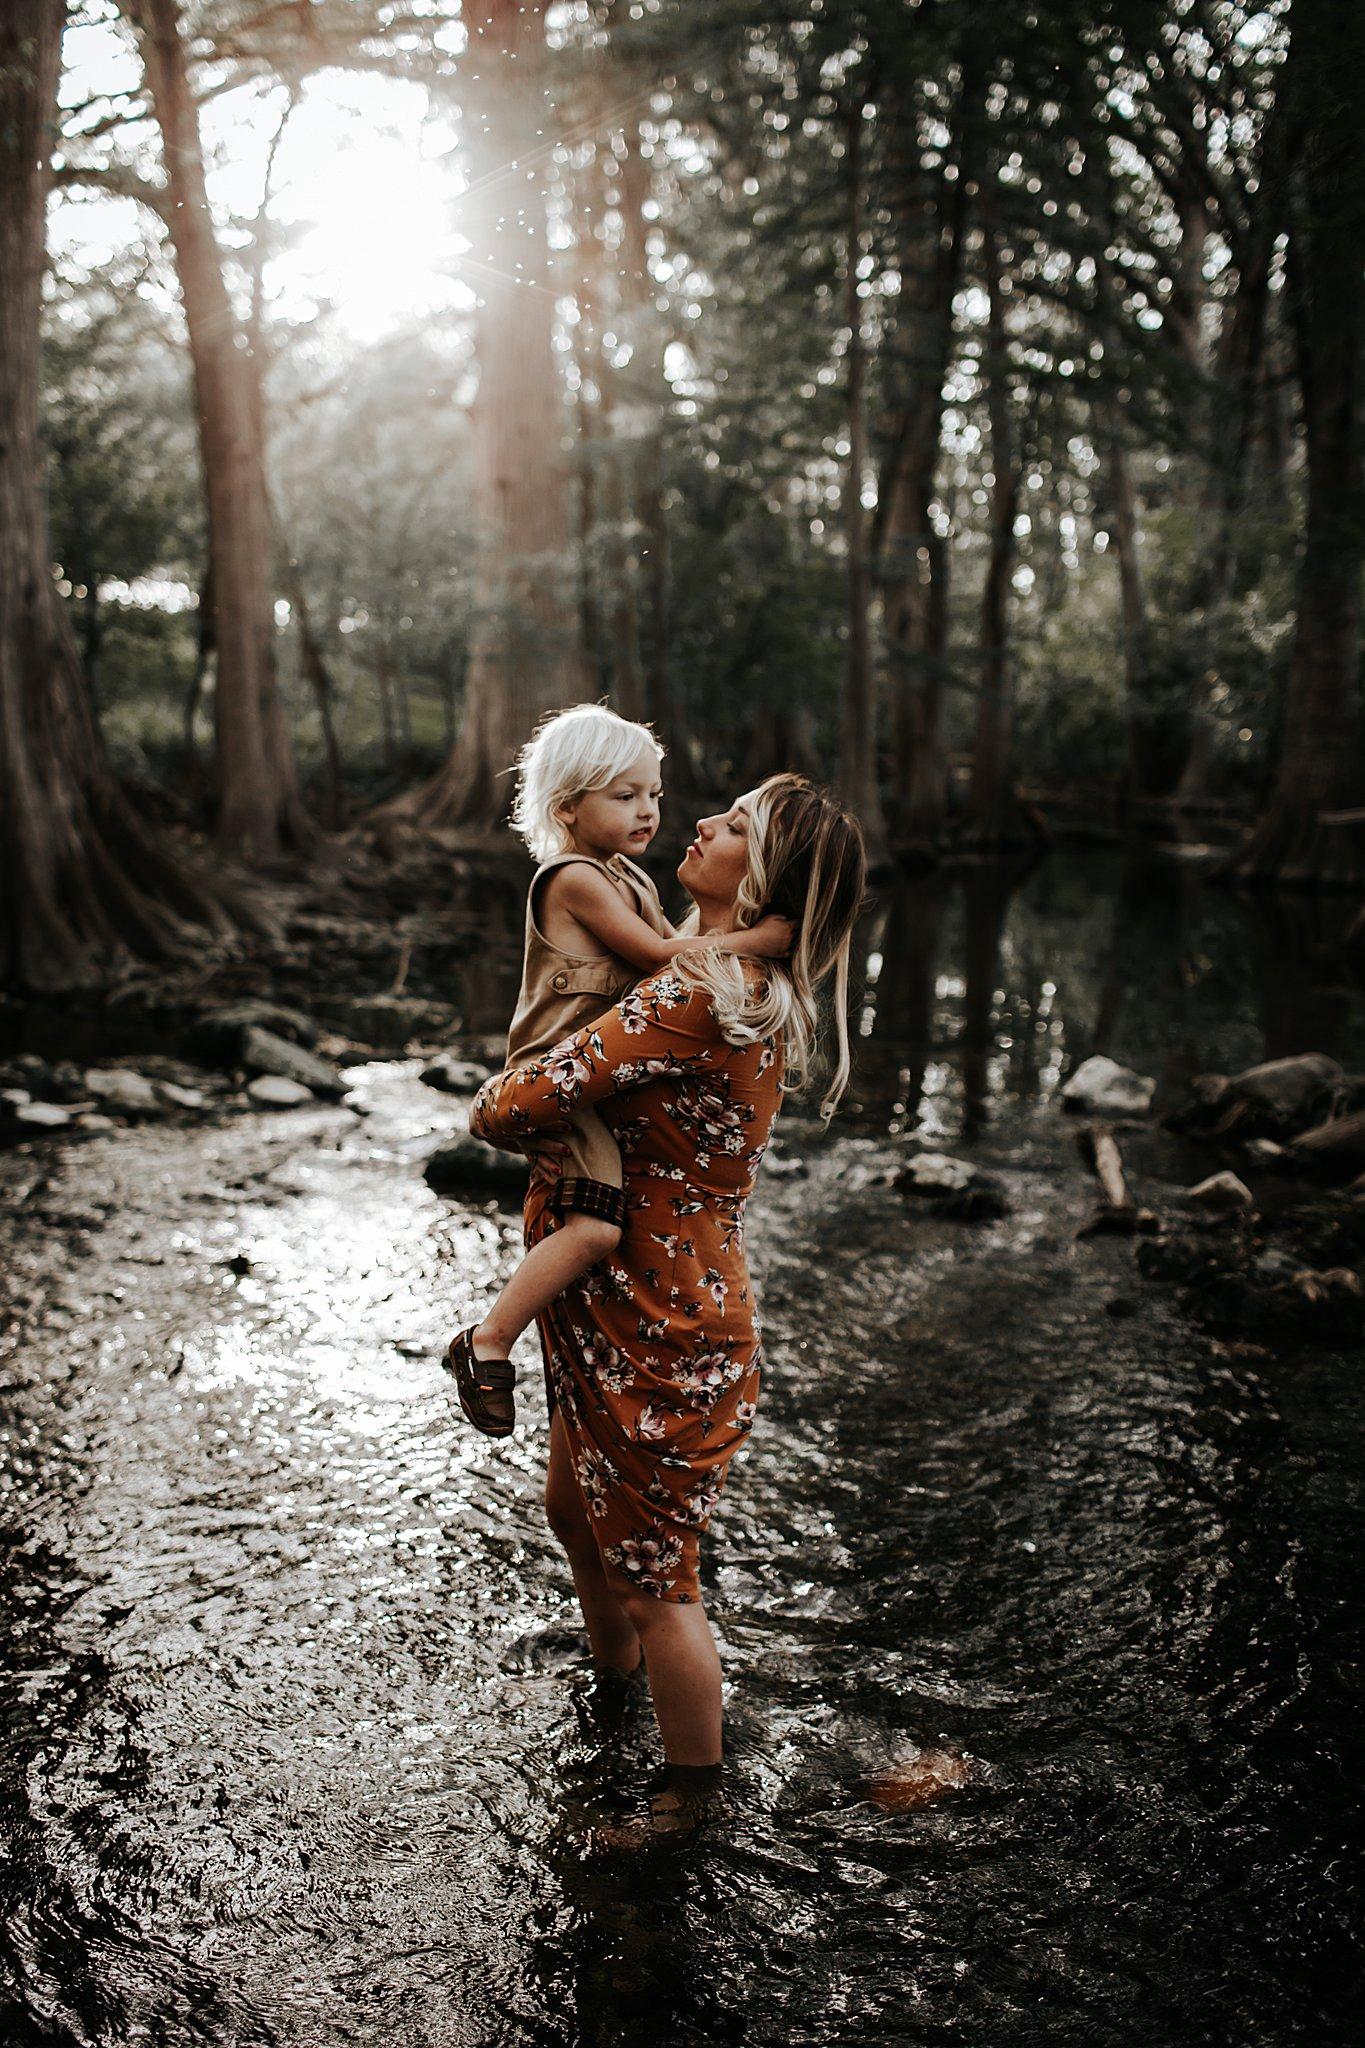 Shannon-San-Antonio-Maternity-Photographer-4_WEB.jpg